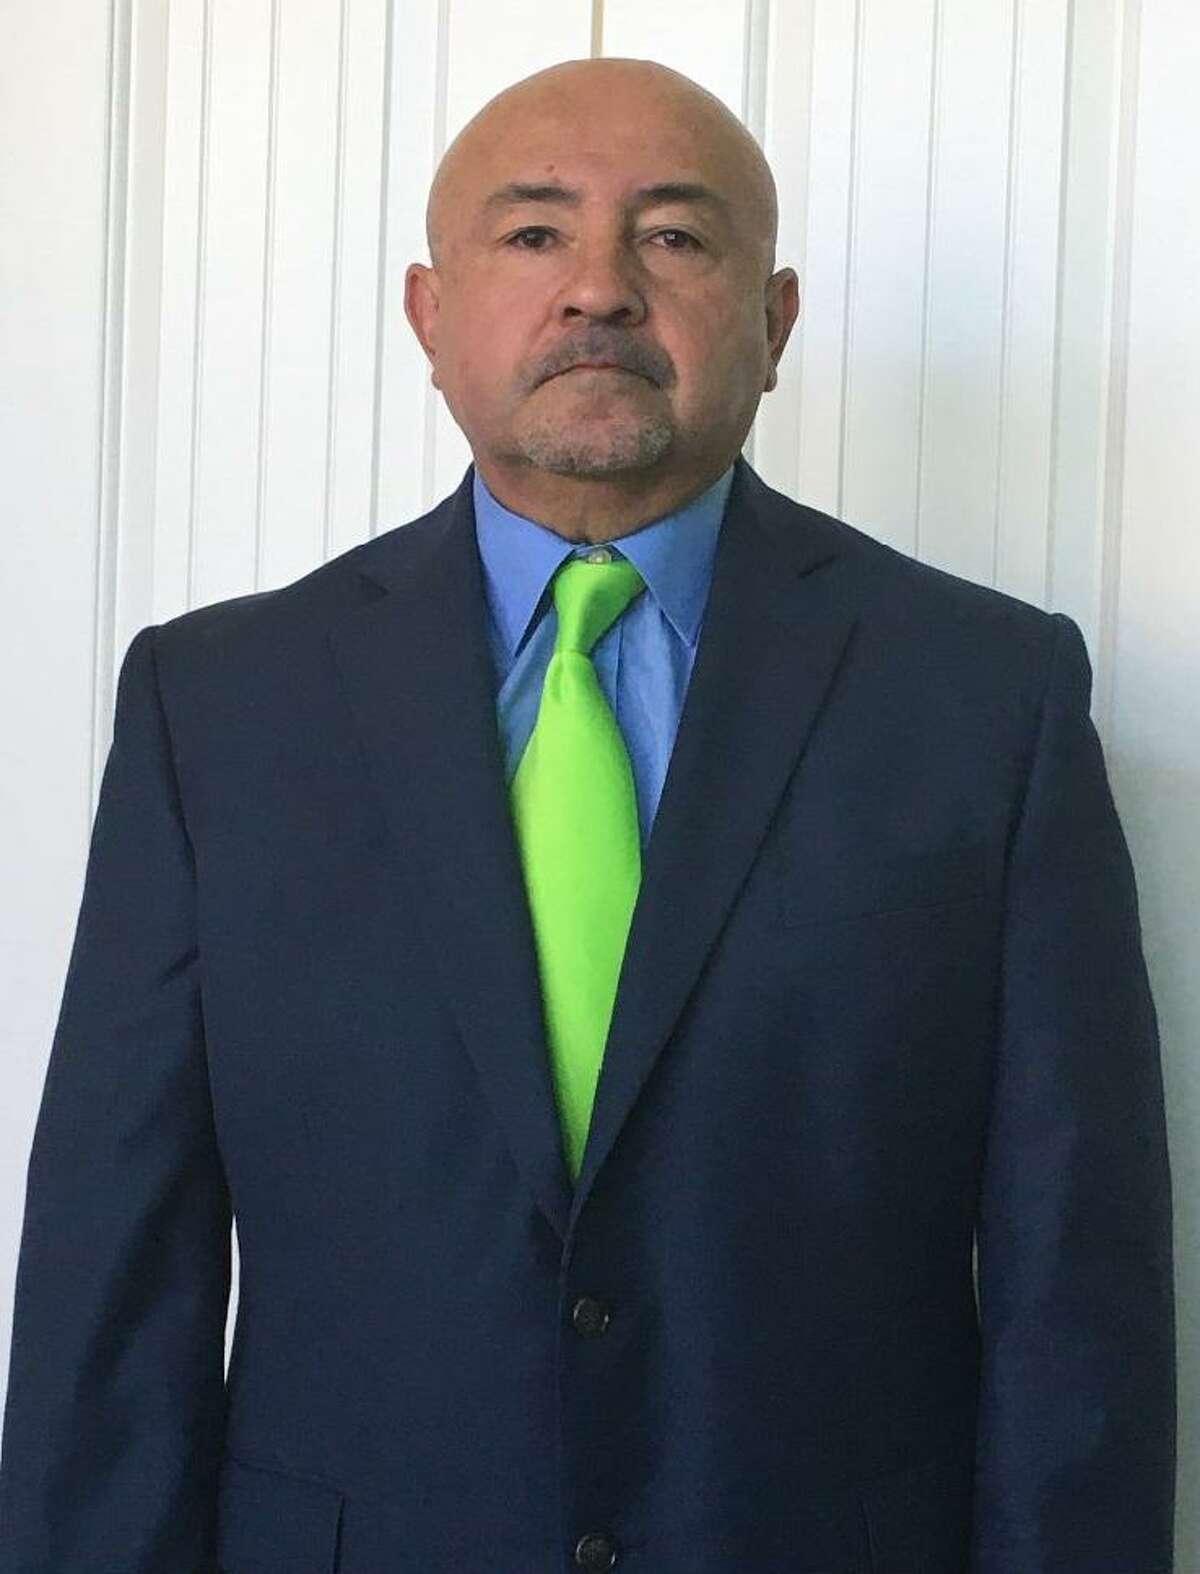 Spring ISD assistant director for athletics Armando Jacinto